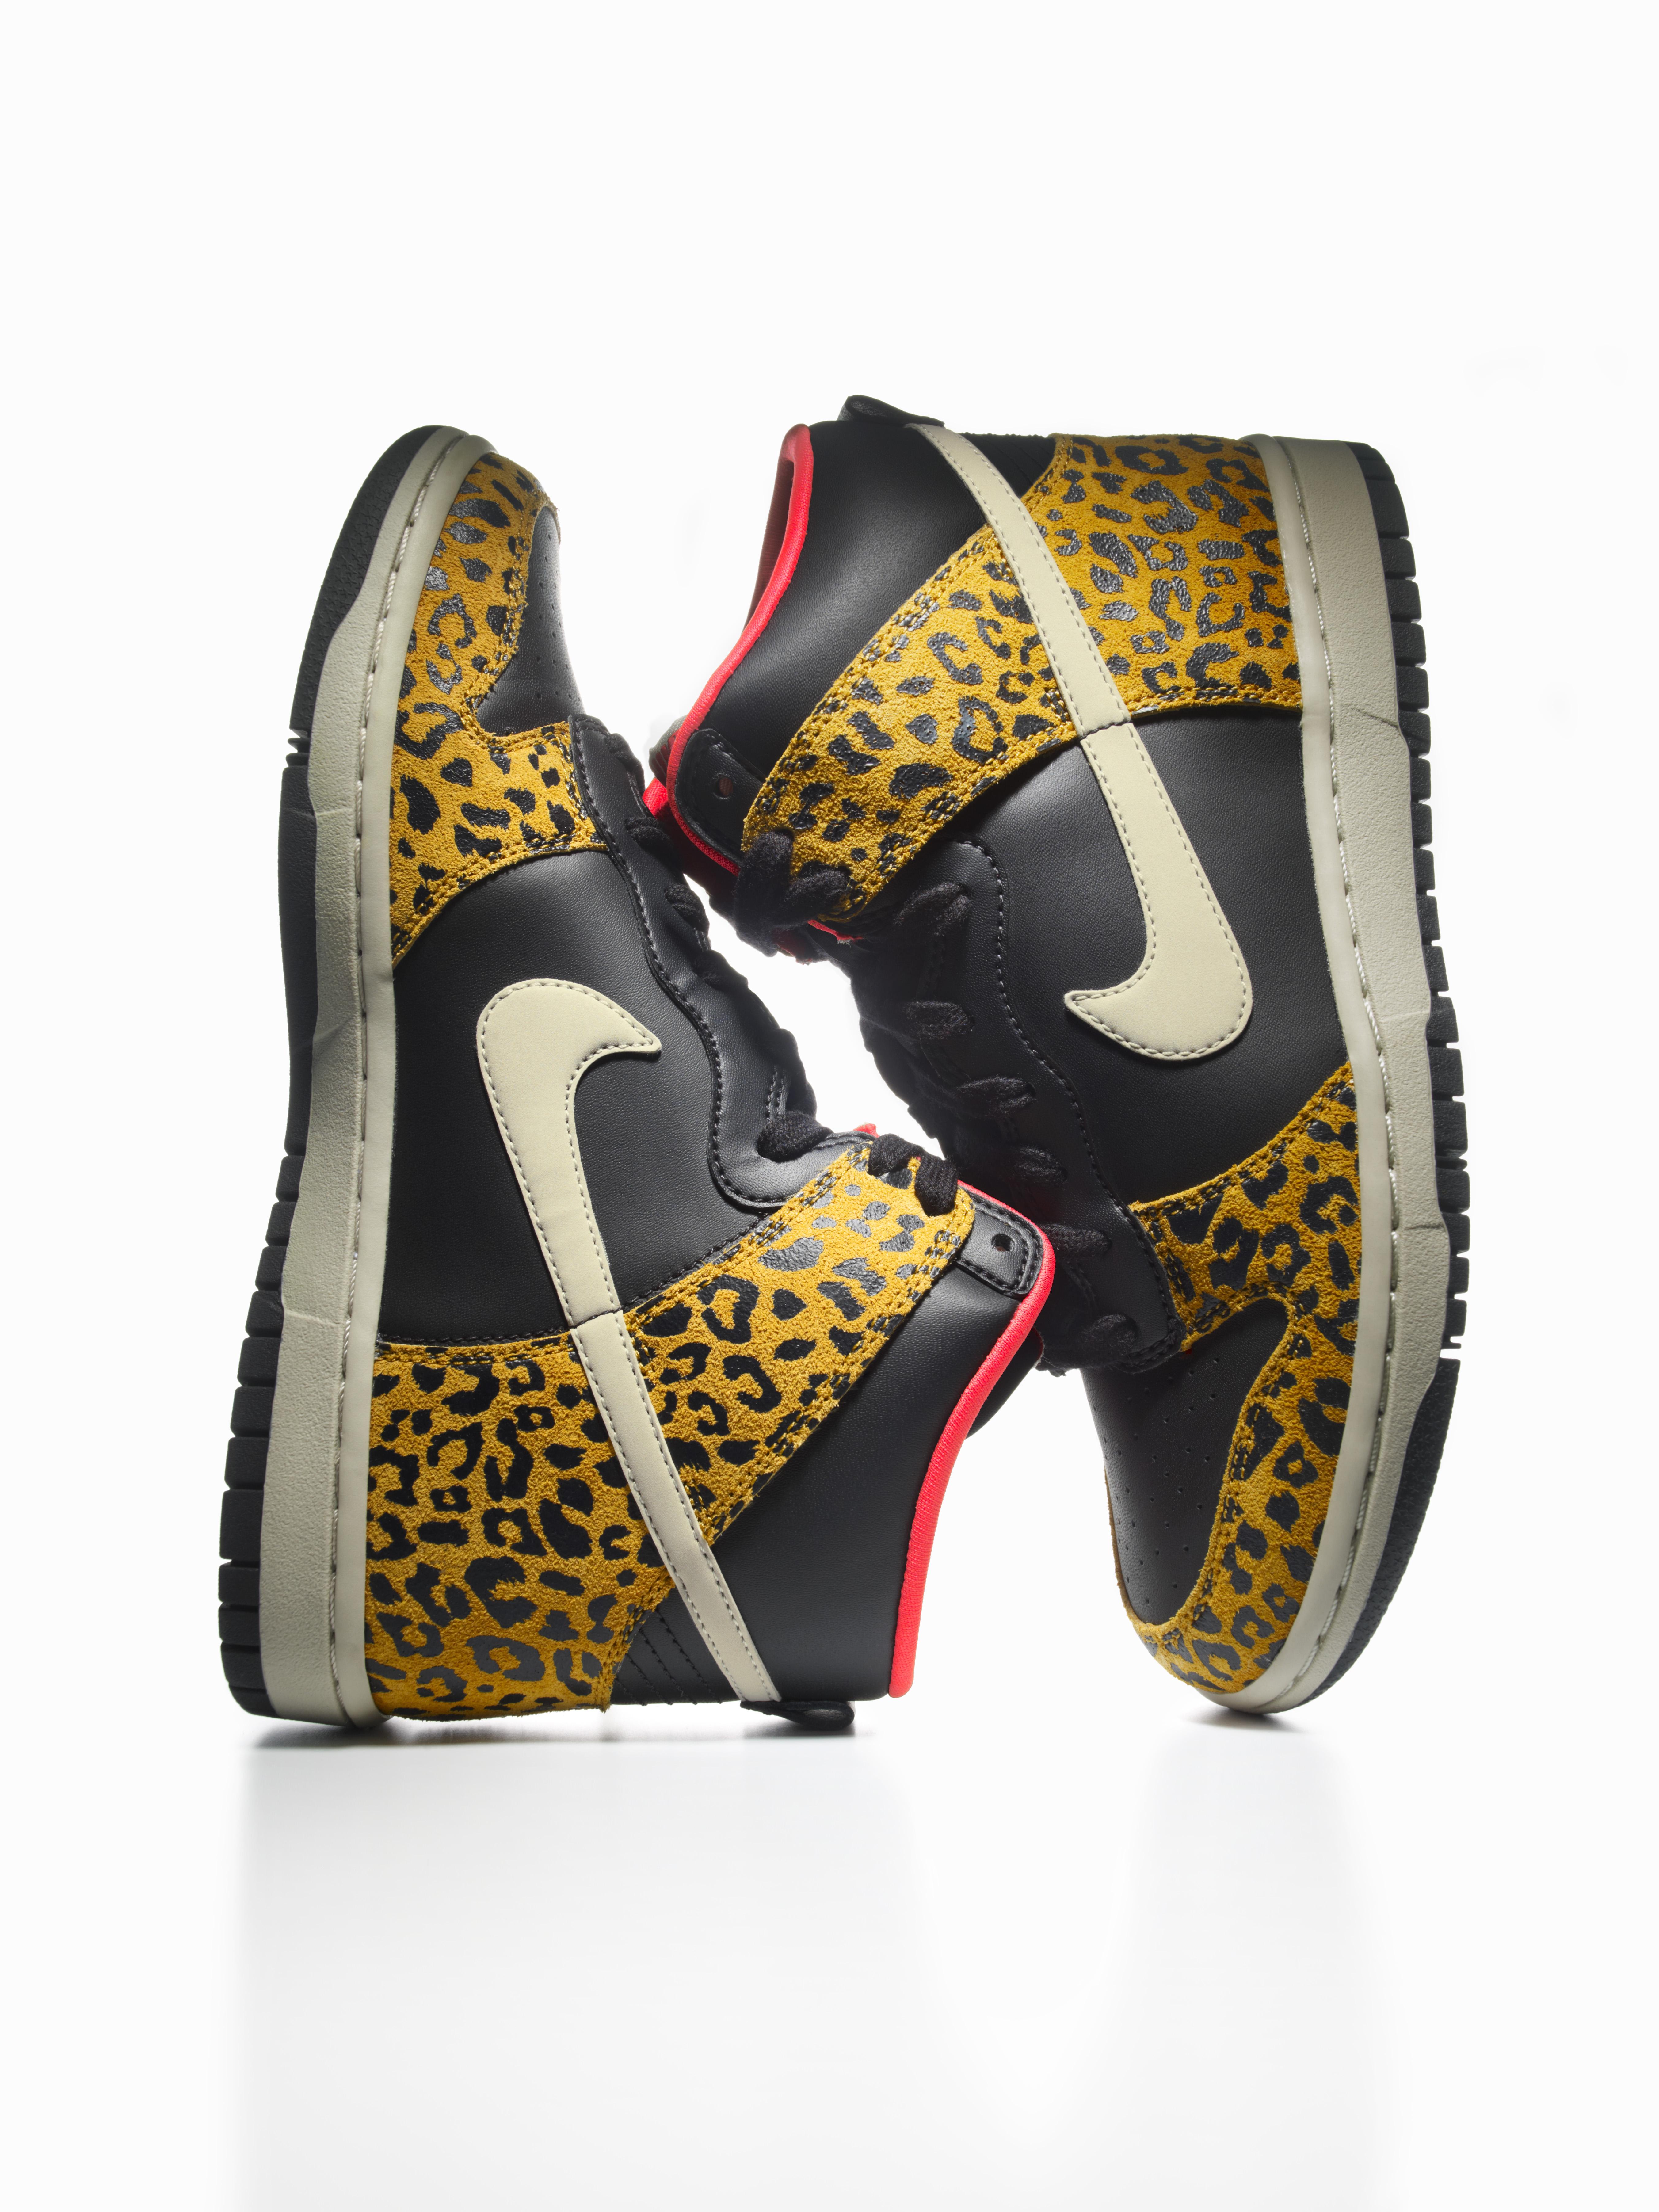 f95267d722b Elites Nike Zoom Soldier 7 Shoes Sale Free